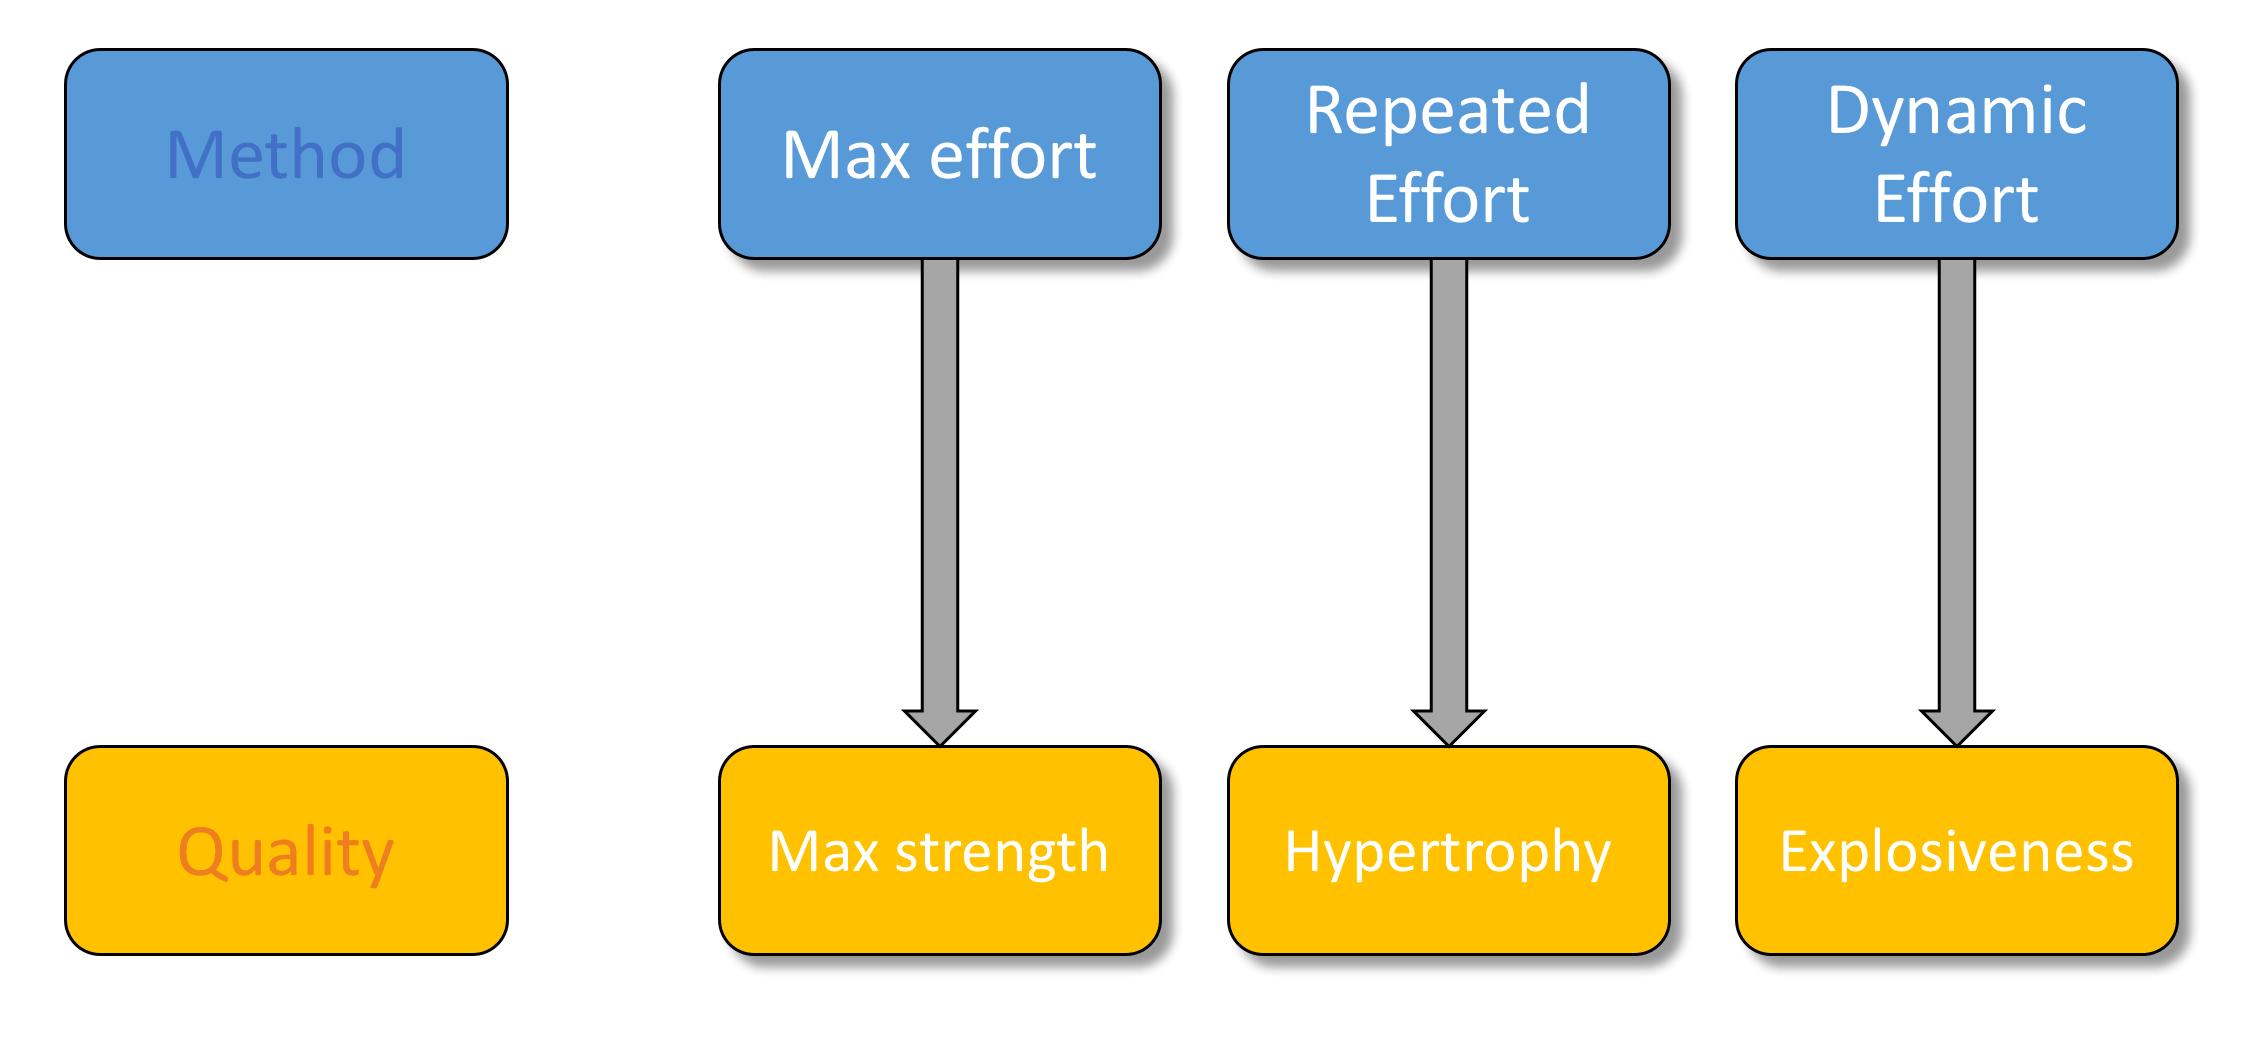 figure-9-simplistic-mental-model-of-methods-and-qualities